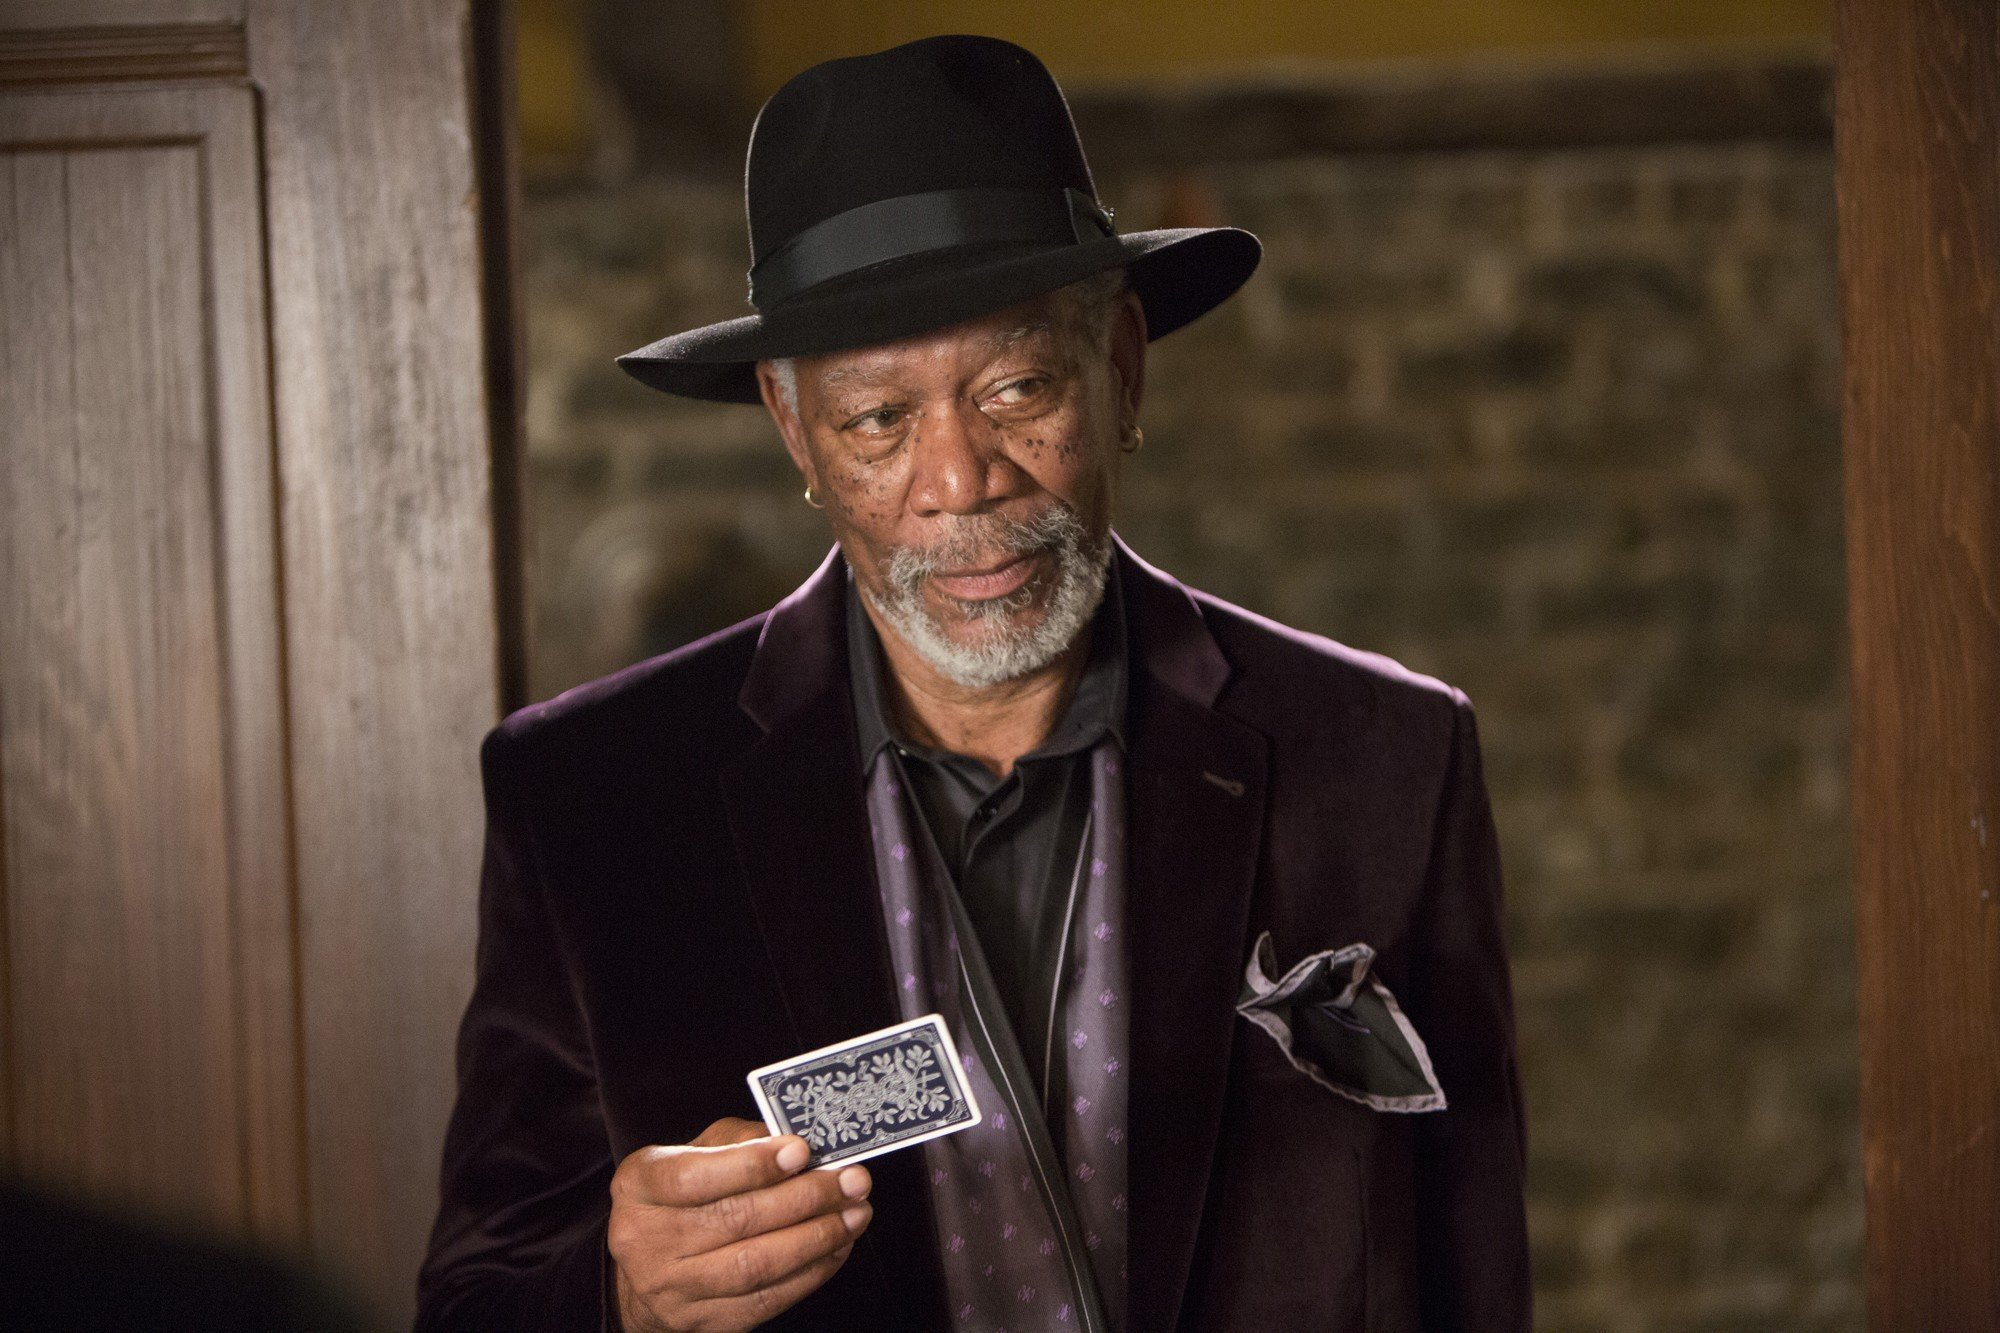 Morgan Freeman Background images